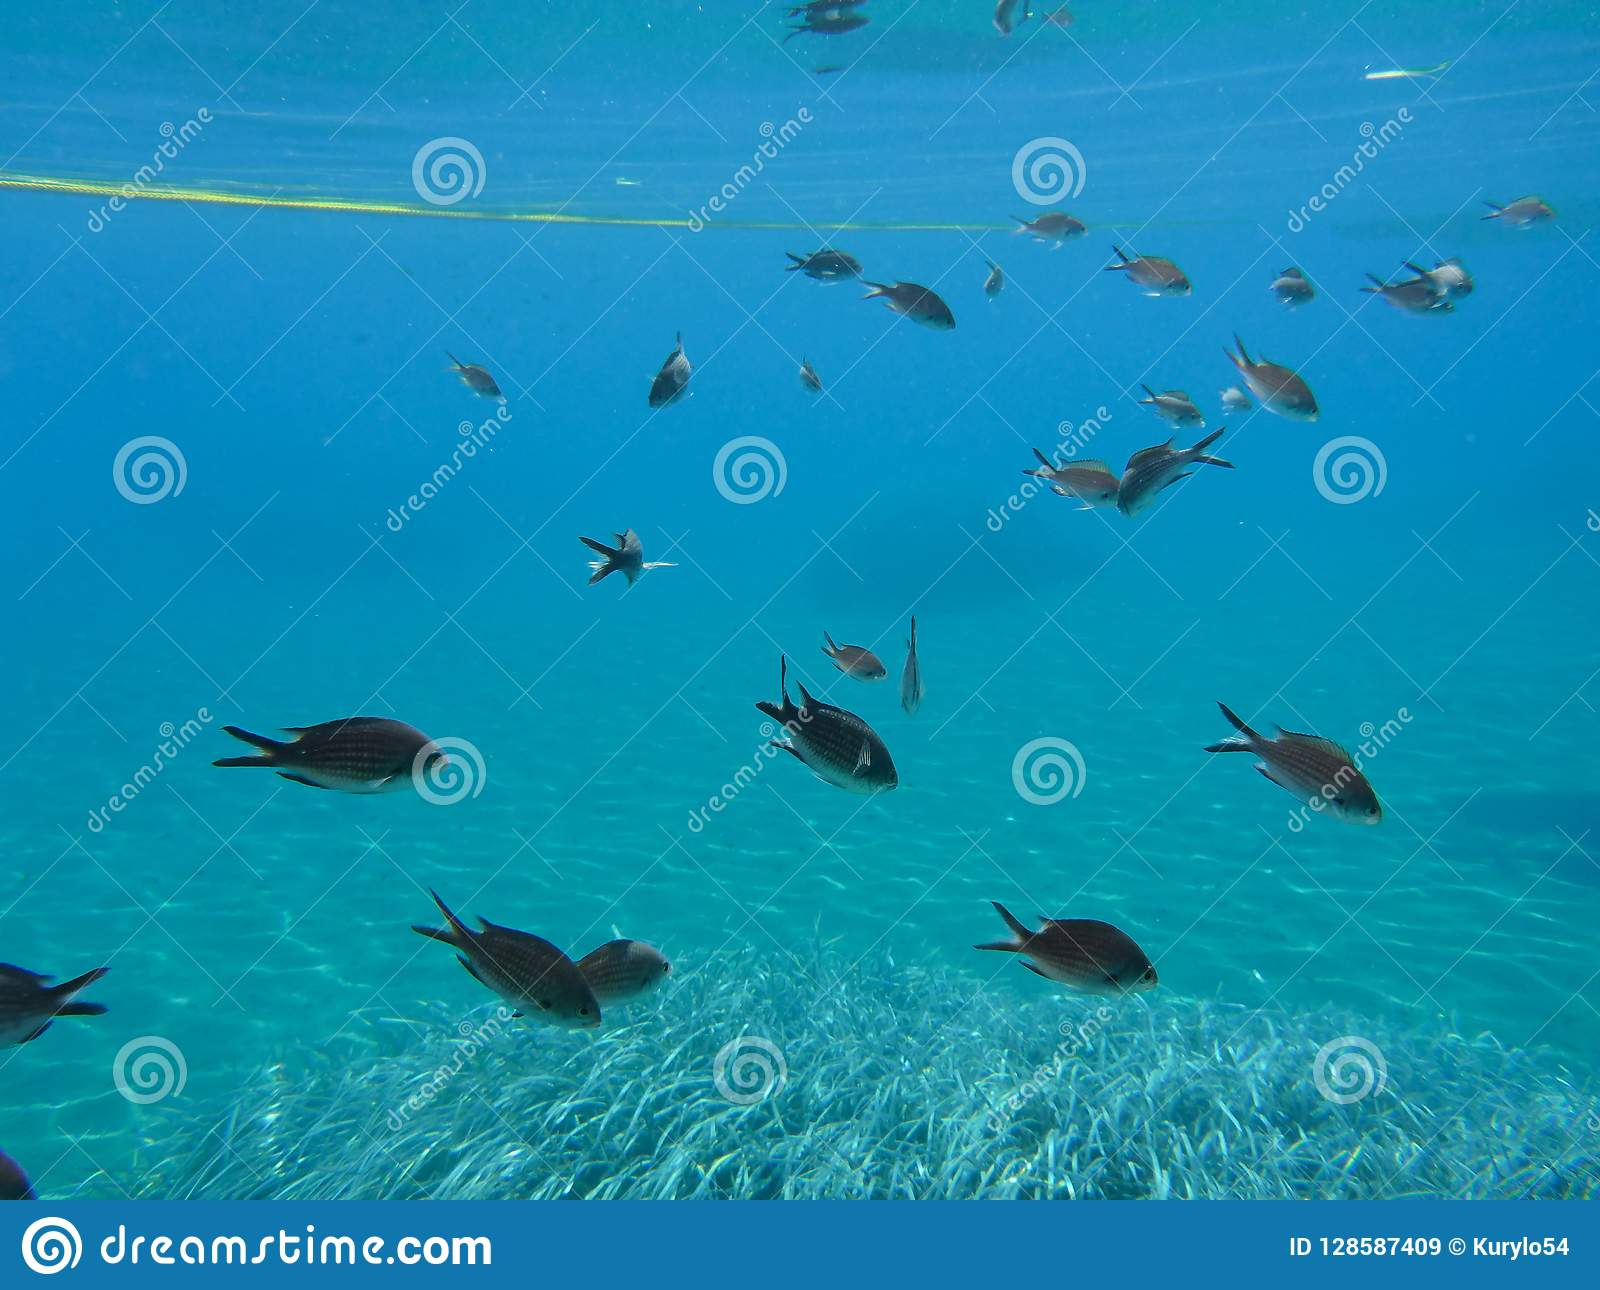 Underwater life kalogries, damselfish or Mediterranean Chromis in Kolona double bay Kythnos island Cyclades Greece, Aegean sea.